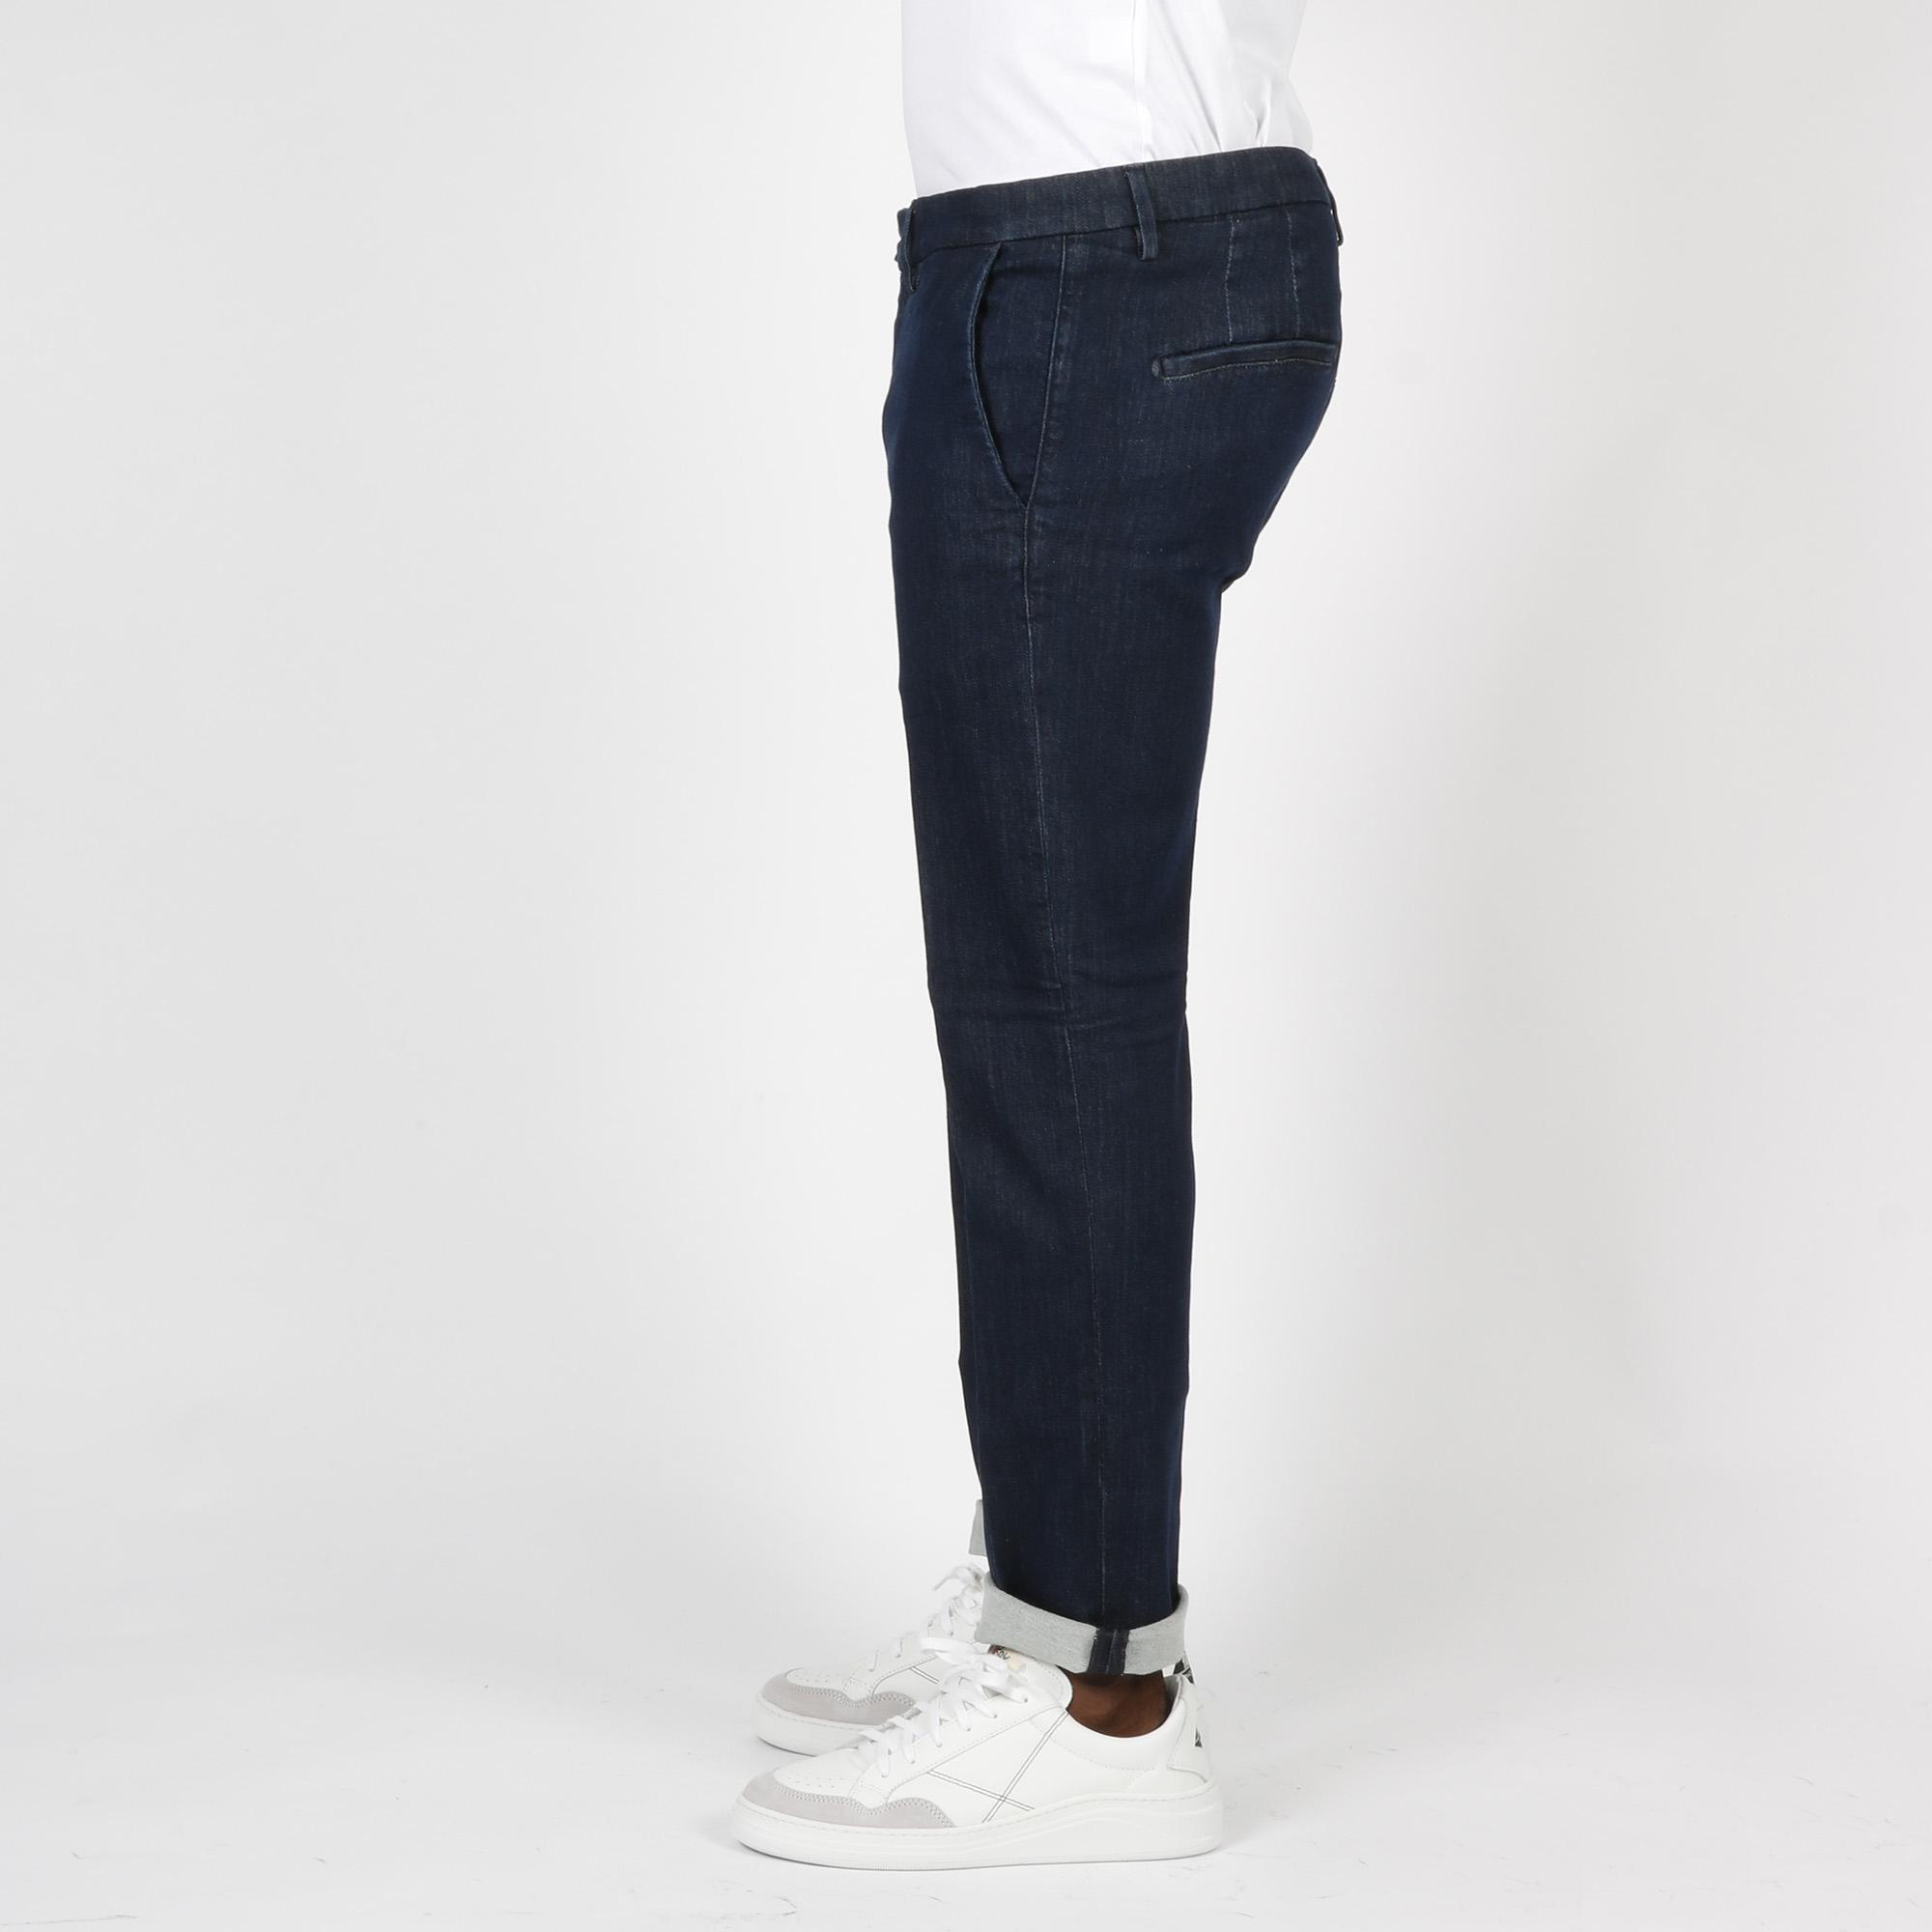 Pantalone Pablo - Denim scuro